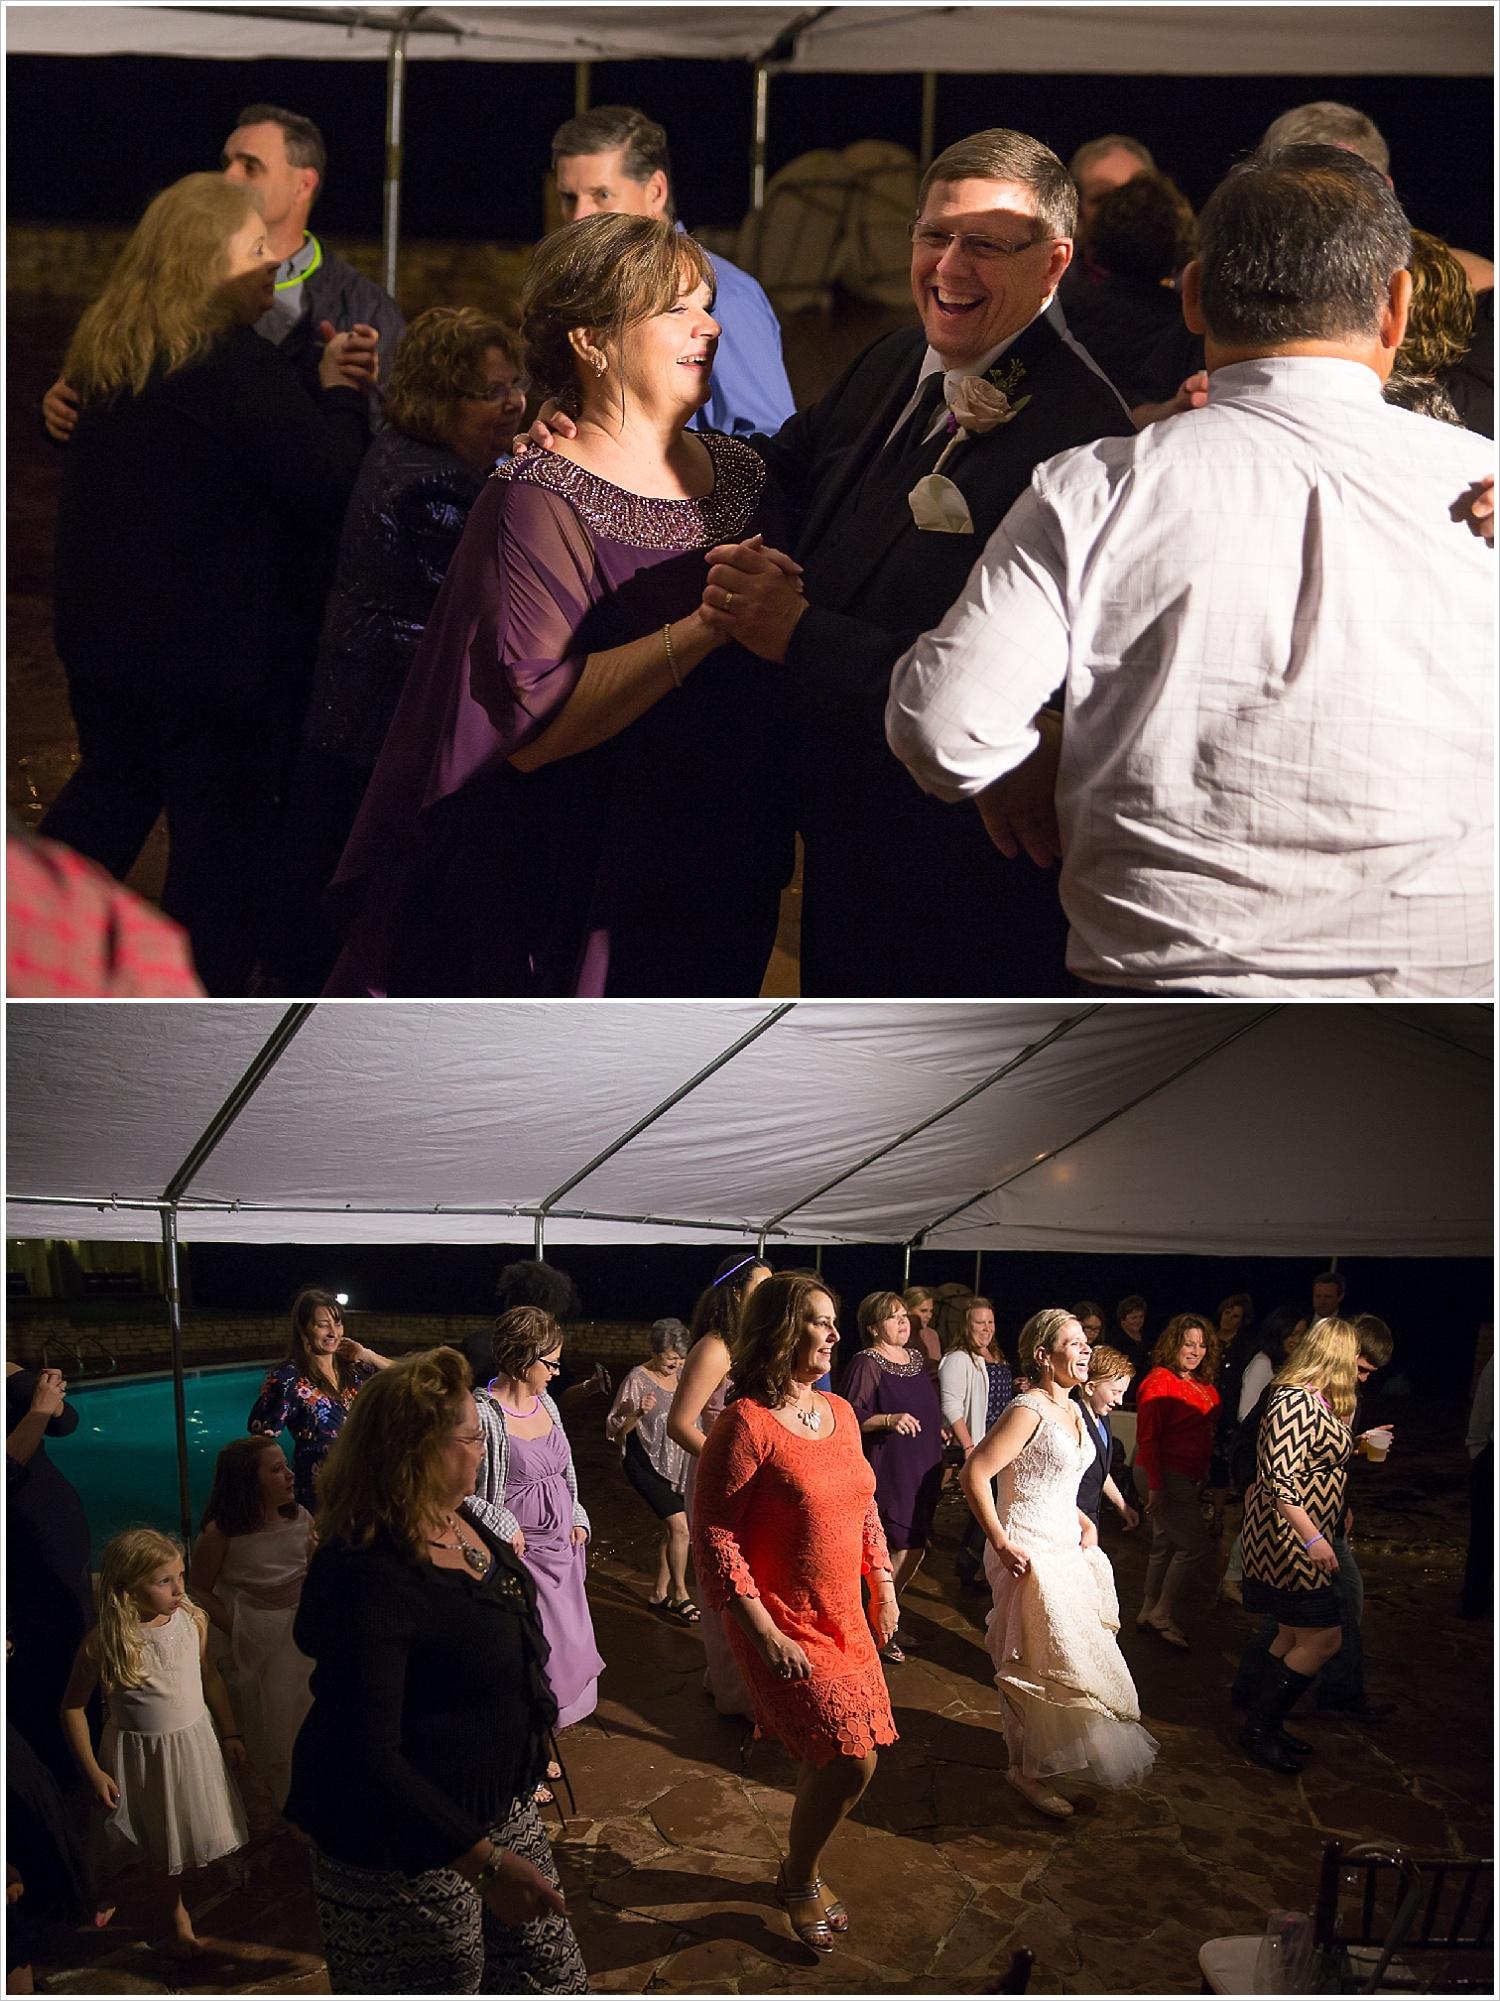 Dancing at rainy wedding reception at La Rio Mansion